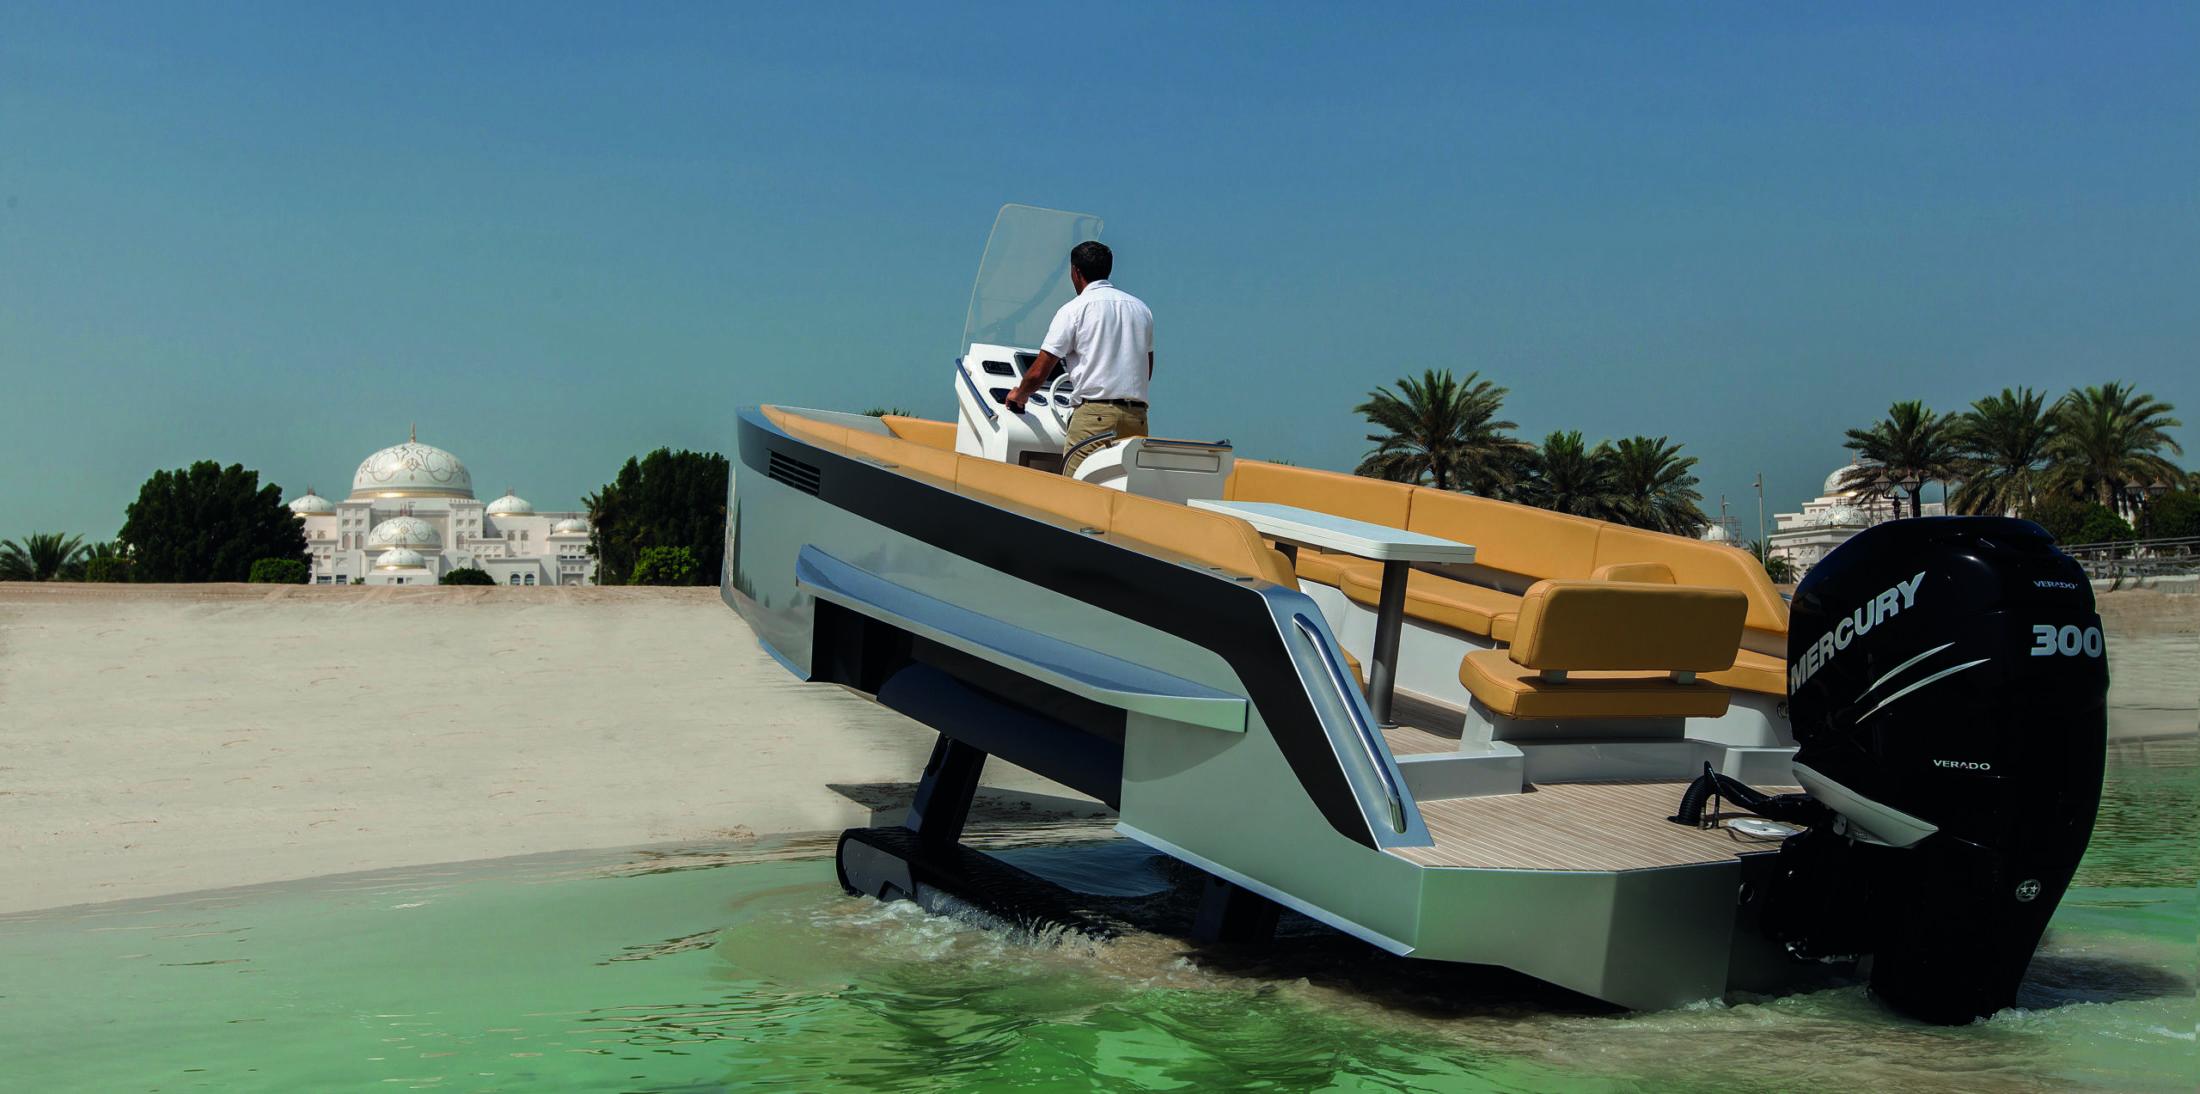 Iguana Original ready to launch on the beach